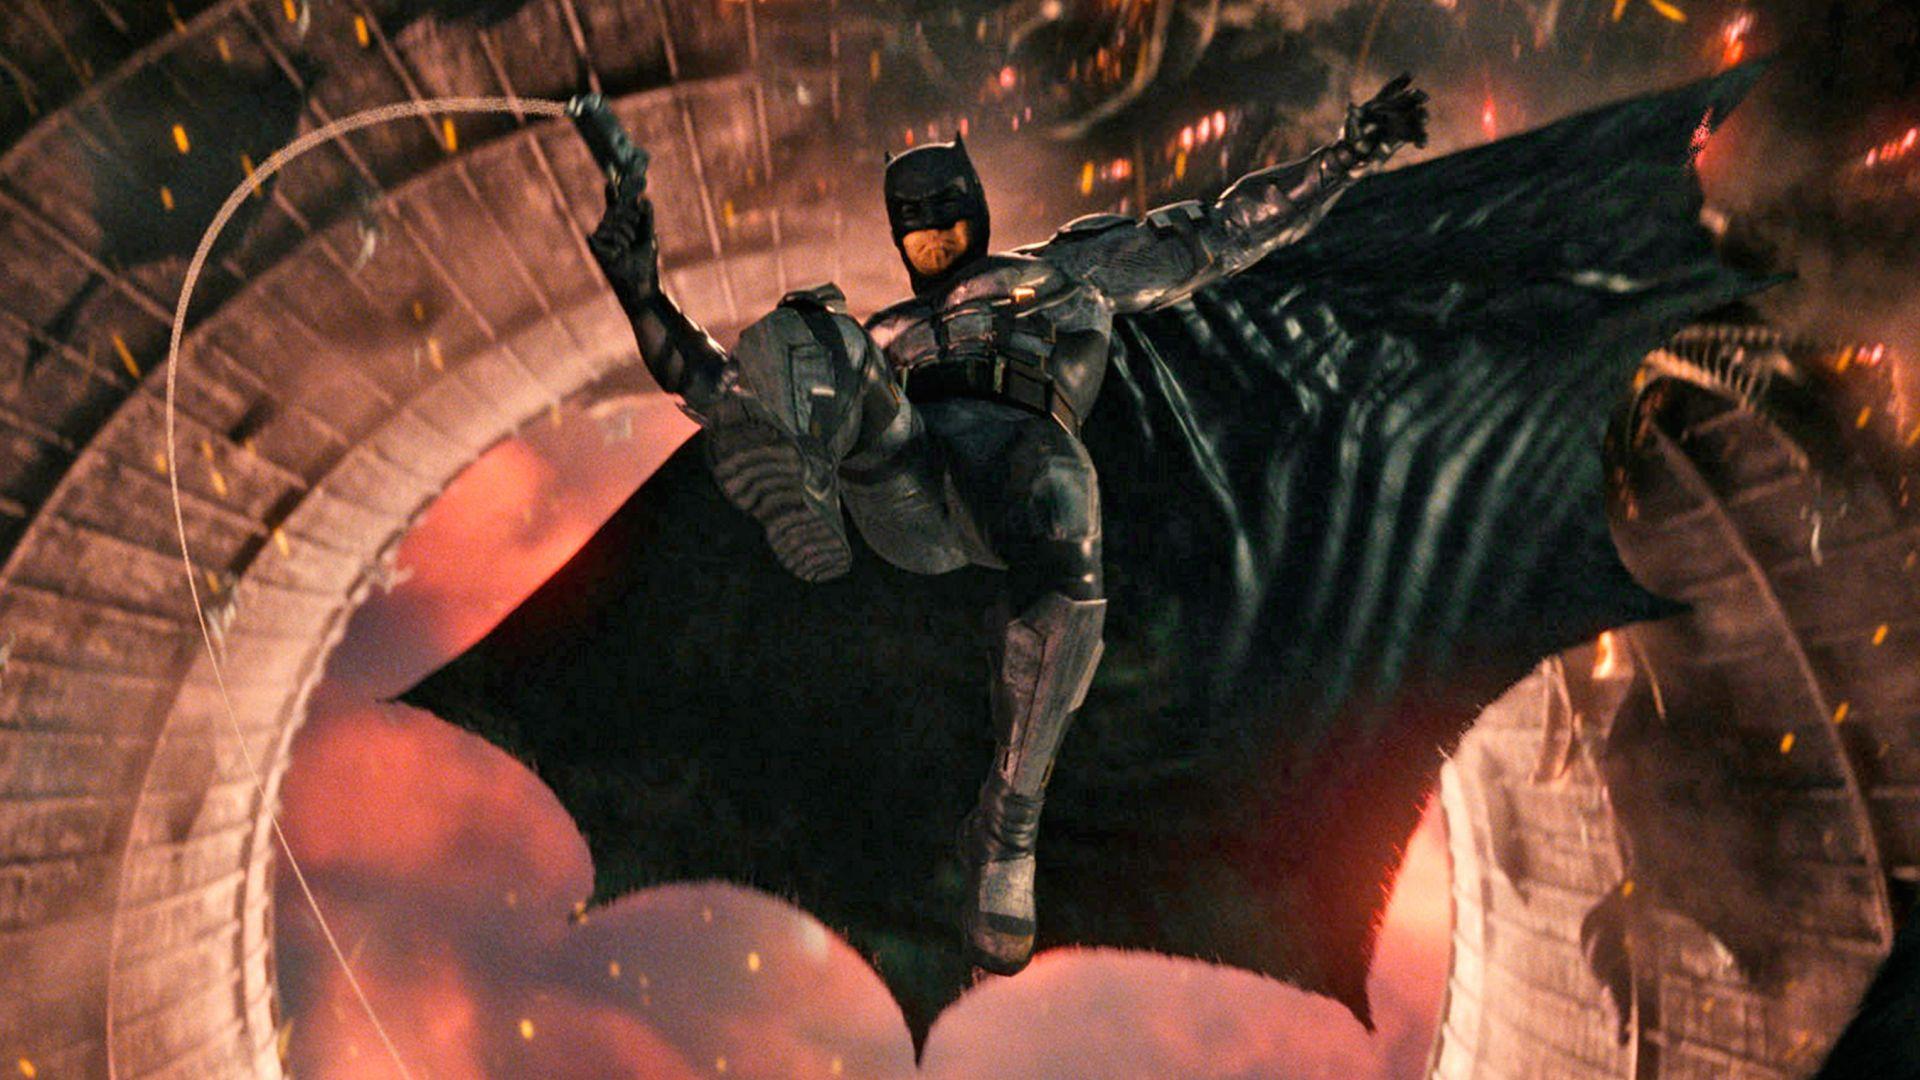 Desktop Wallpaper Batman Justice League Jump 2017 Movie Hd Image